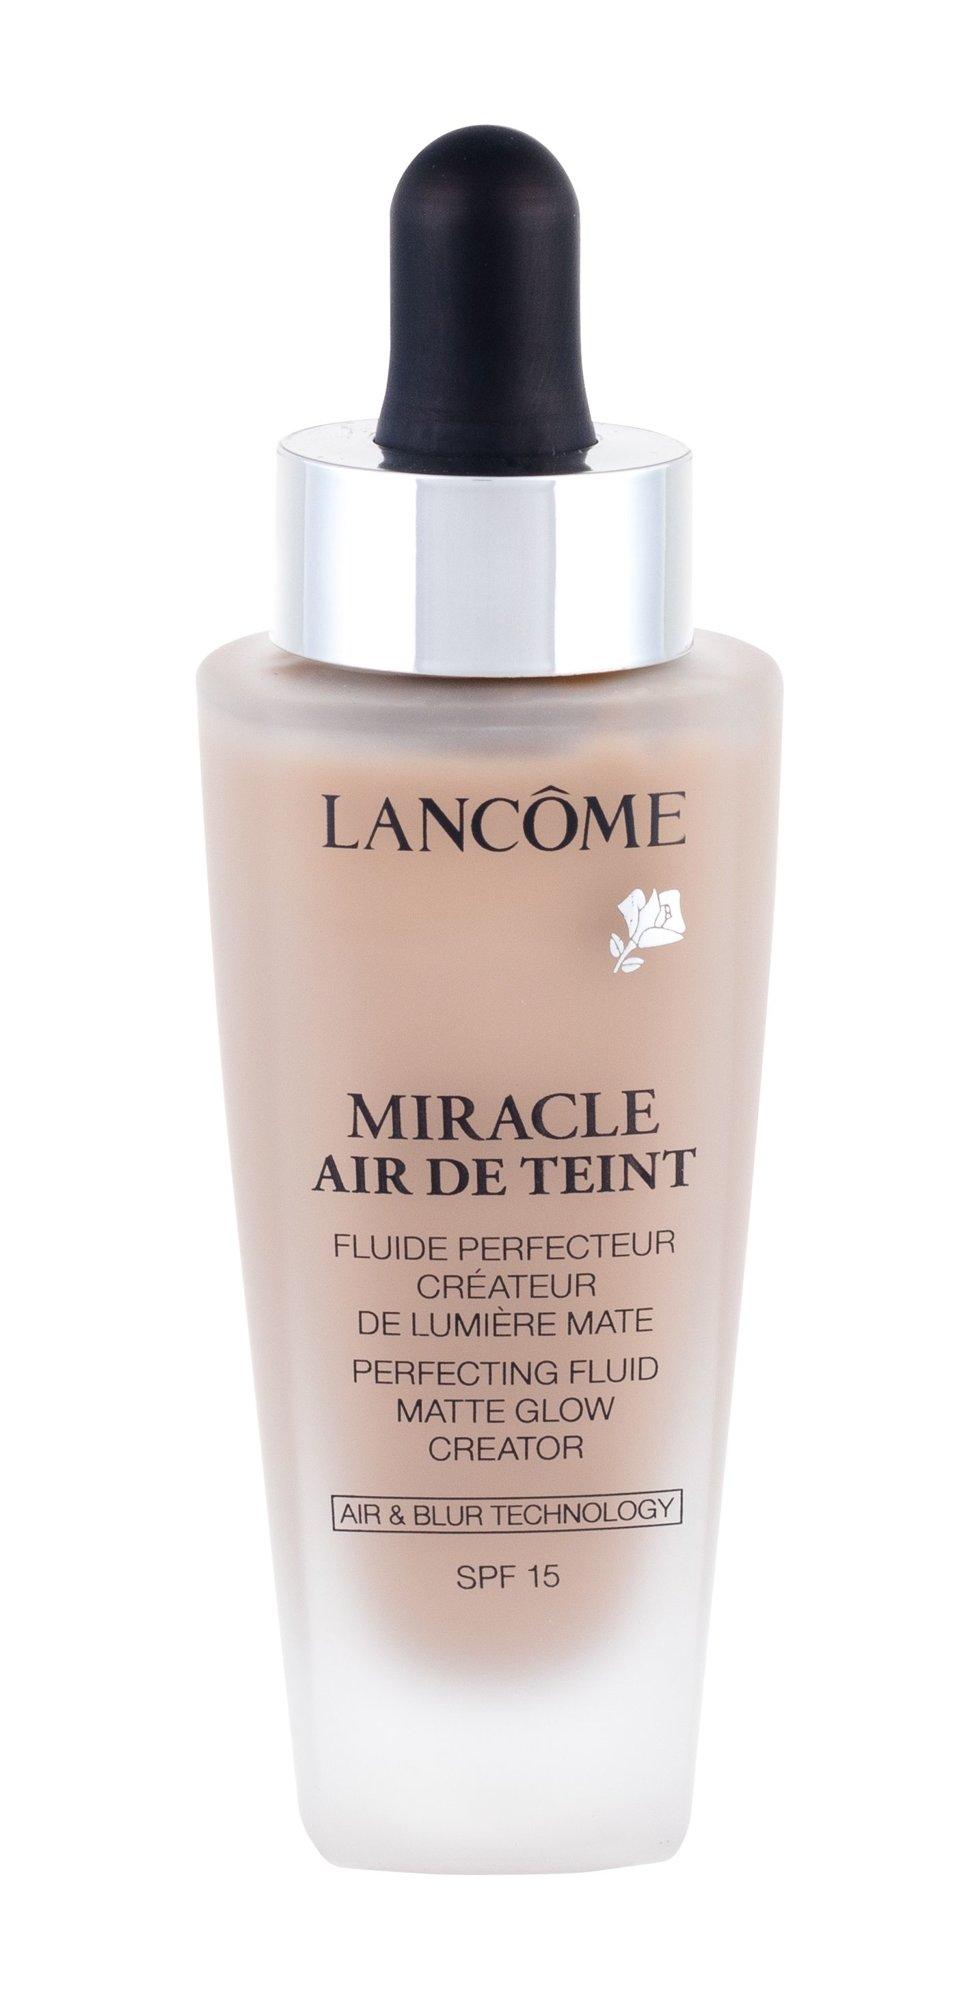 Lancôme Miracle Air De Teint Cosmetic 30ml 010 Beige Porcelaine